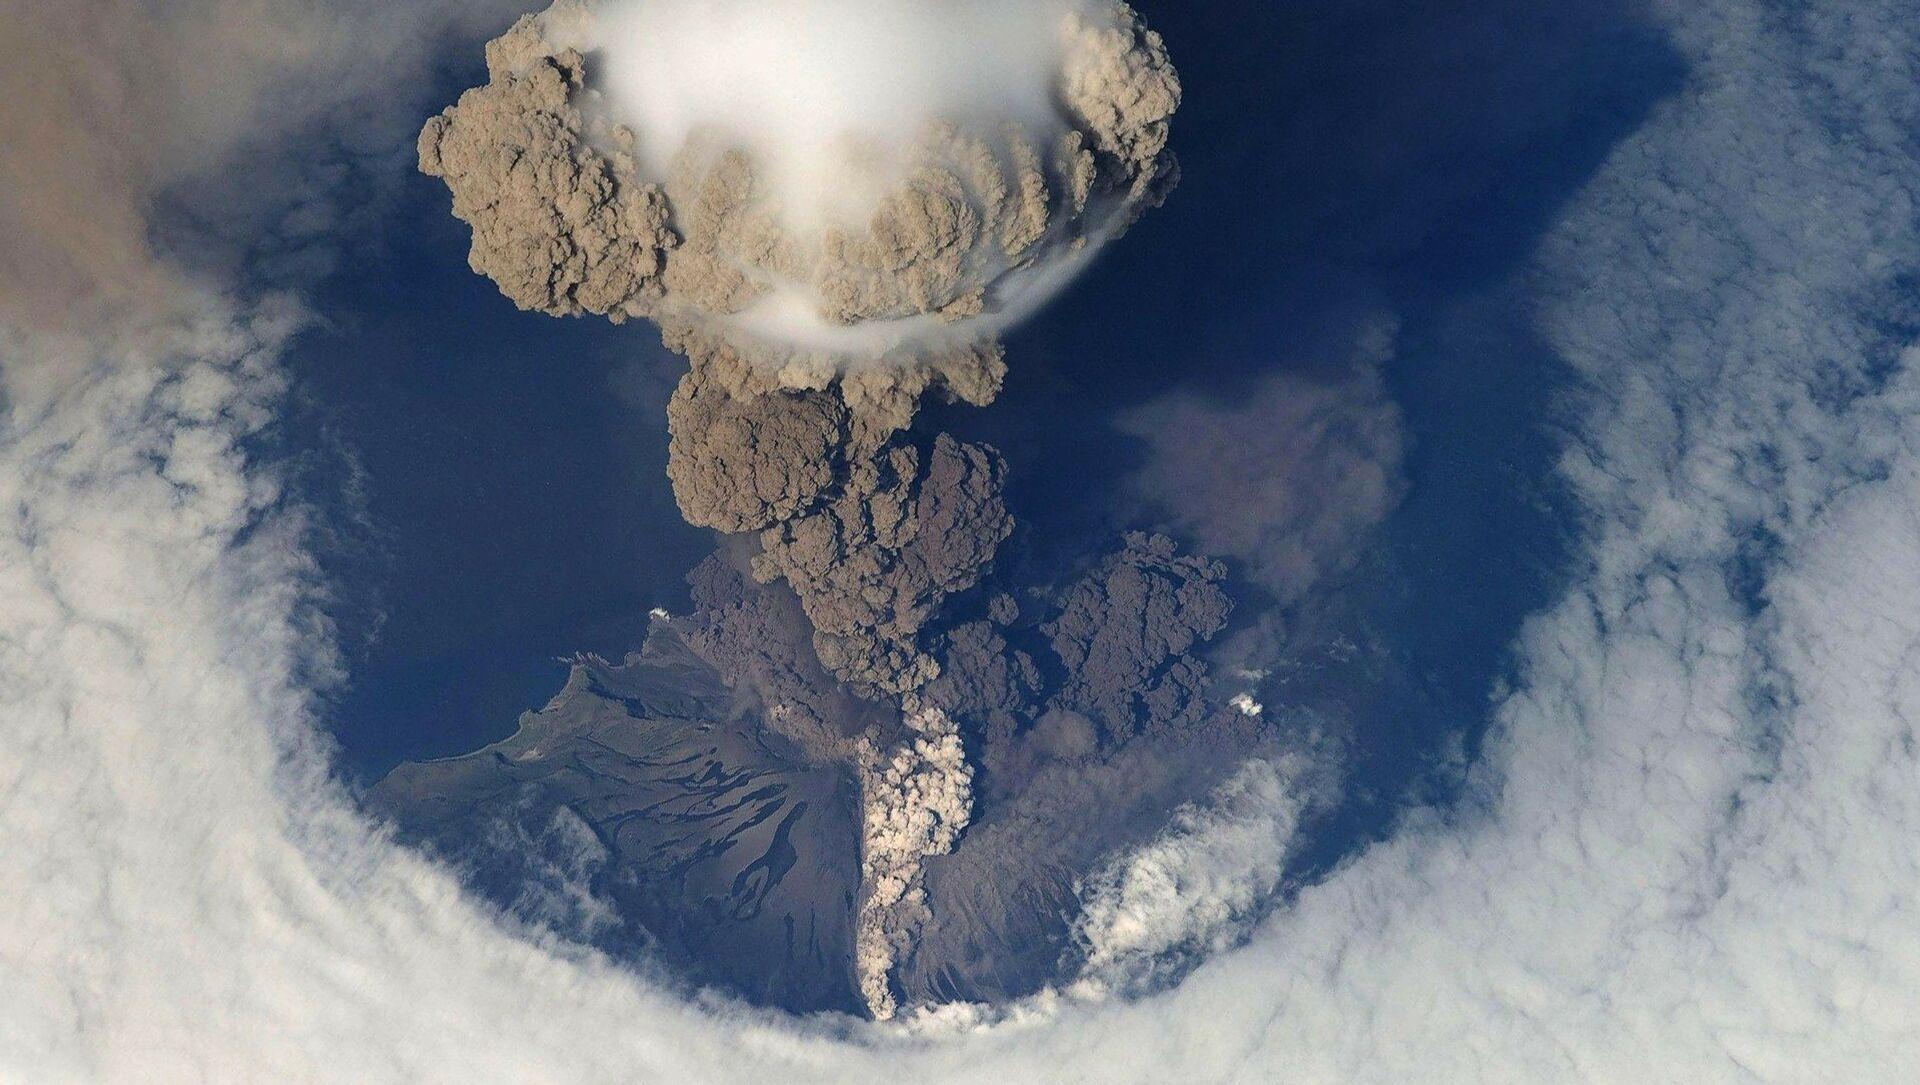 Volcanic eruption - Sputnik International, 1920, 28.07.2021